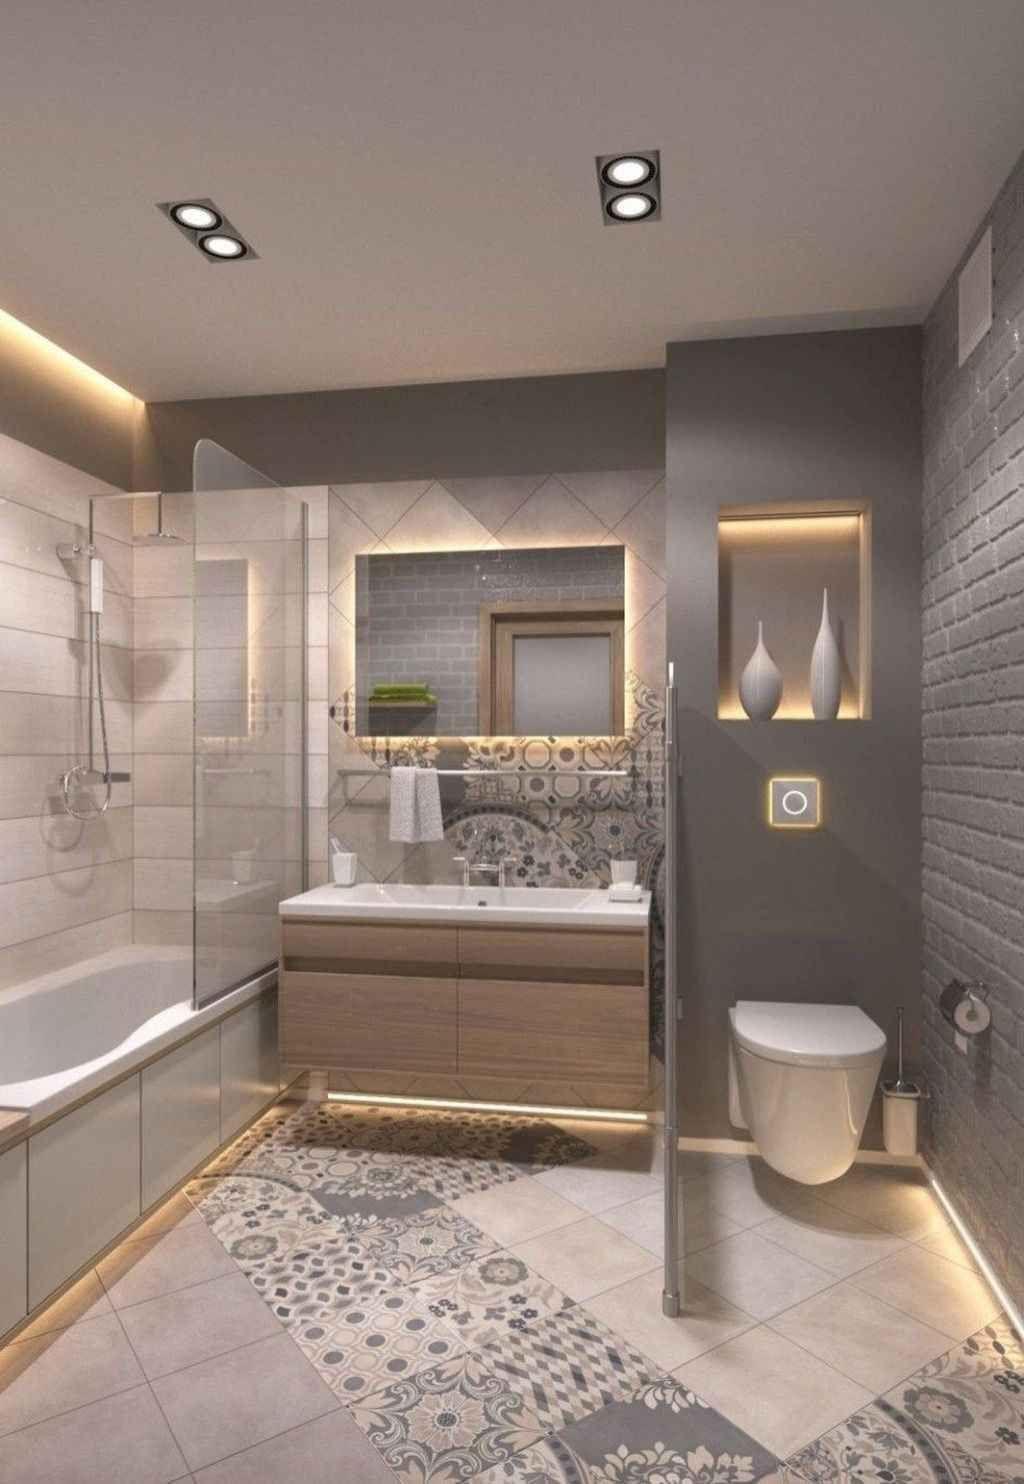 02 beautiful master bathroom remodel ideas in 2020 on bathroom renovation ideas 2020 id=54472